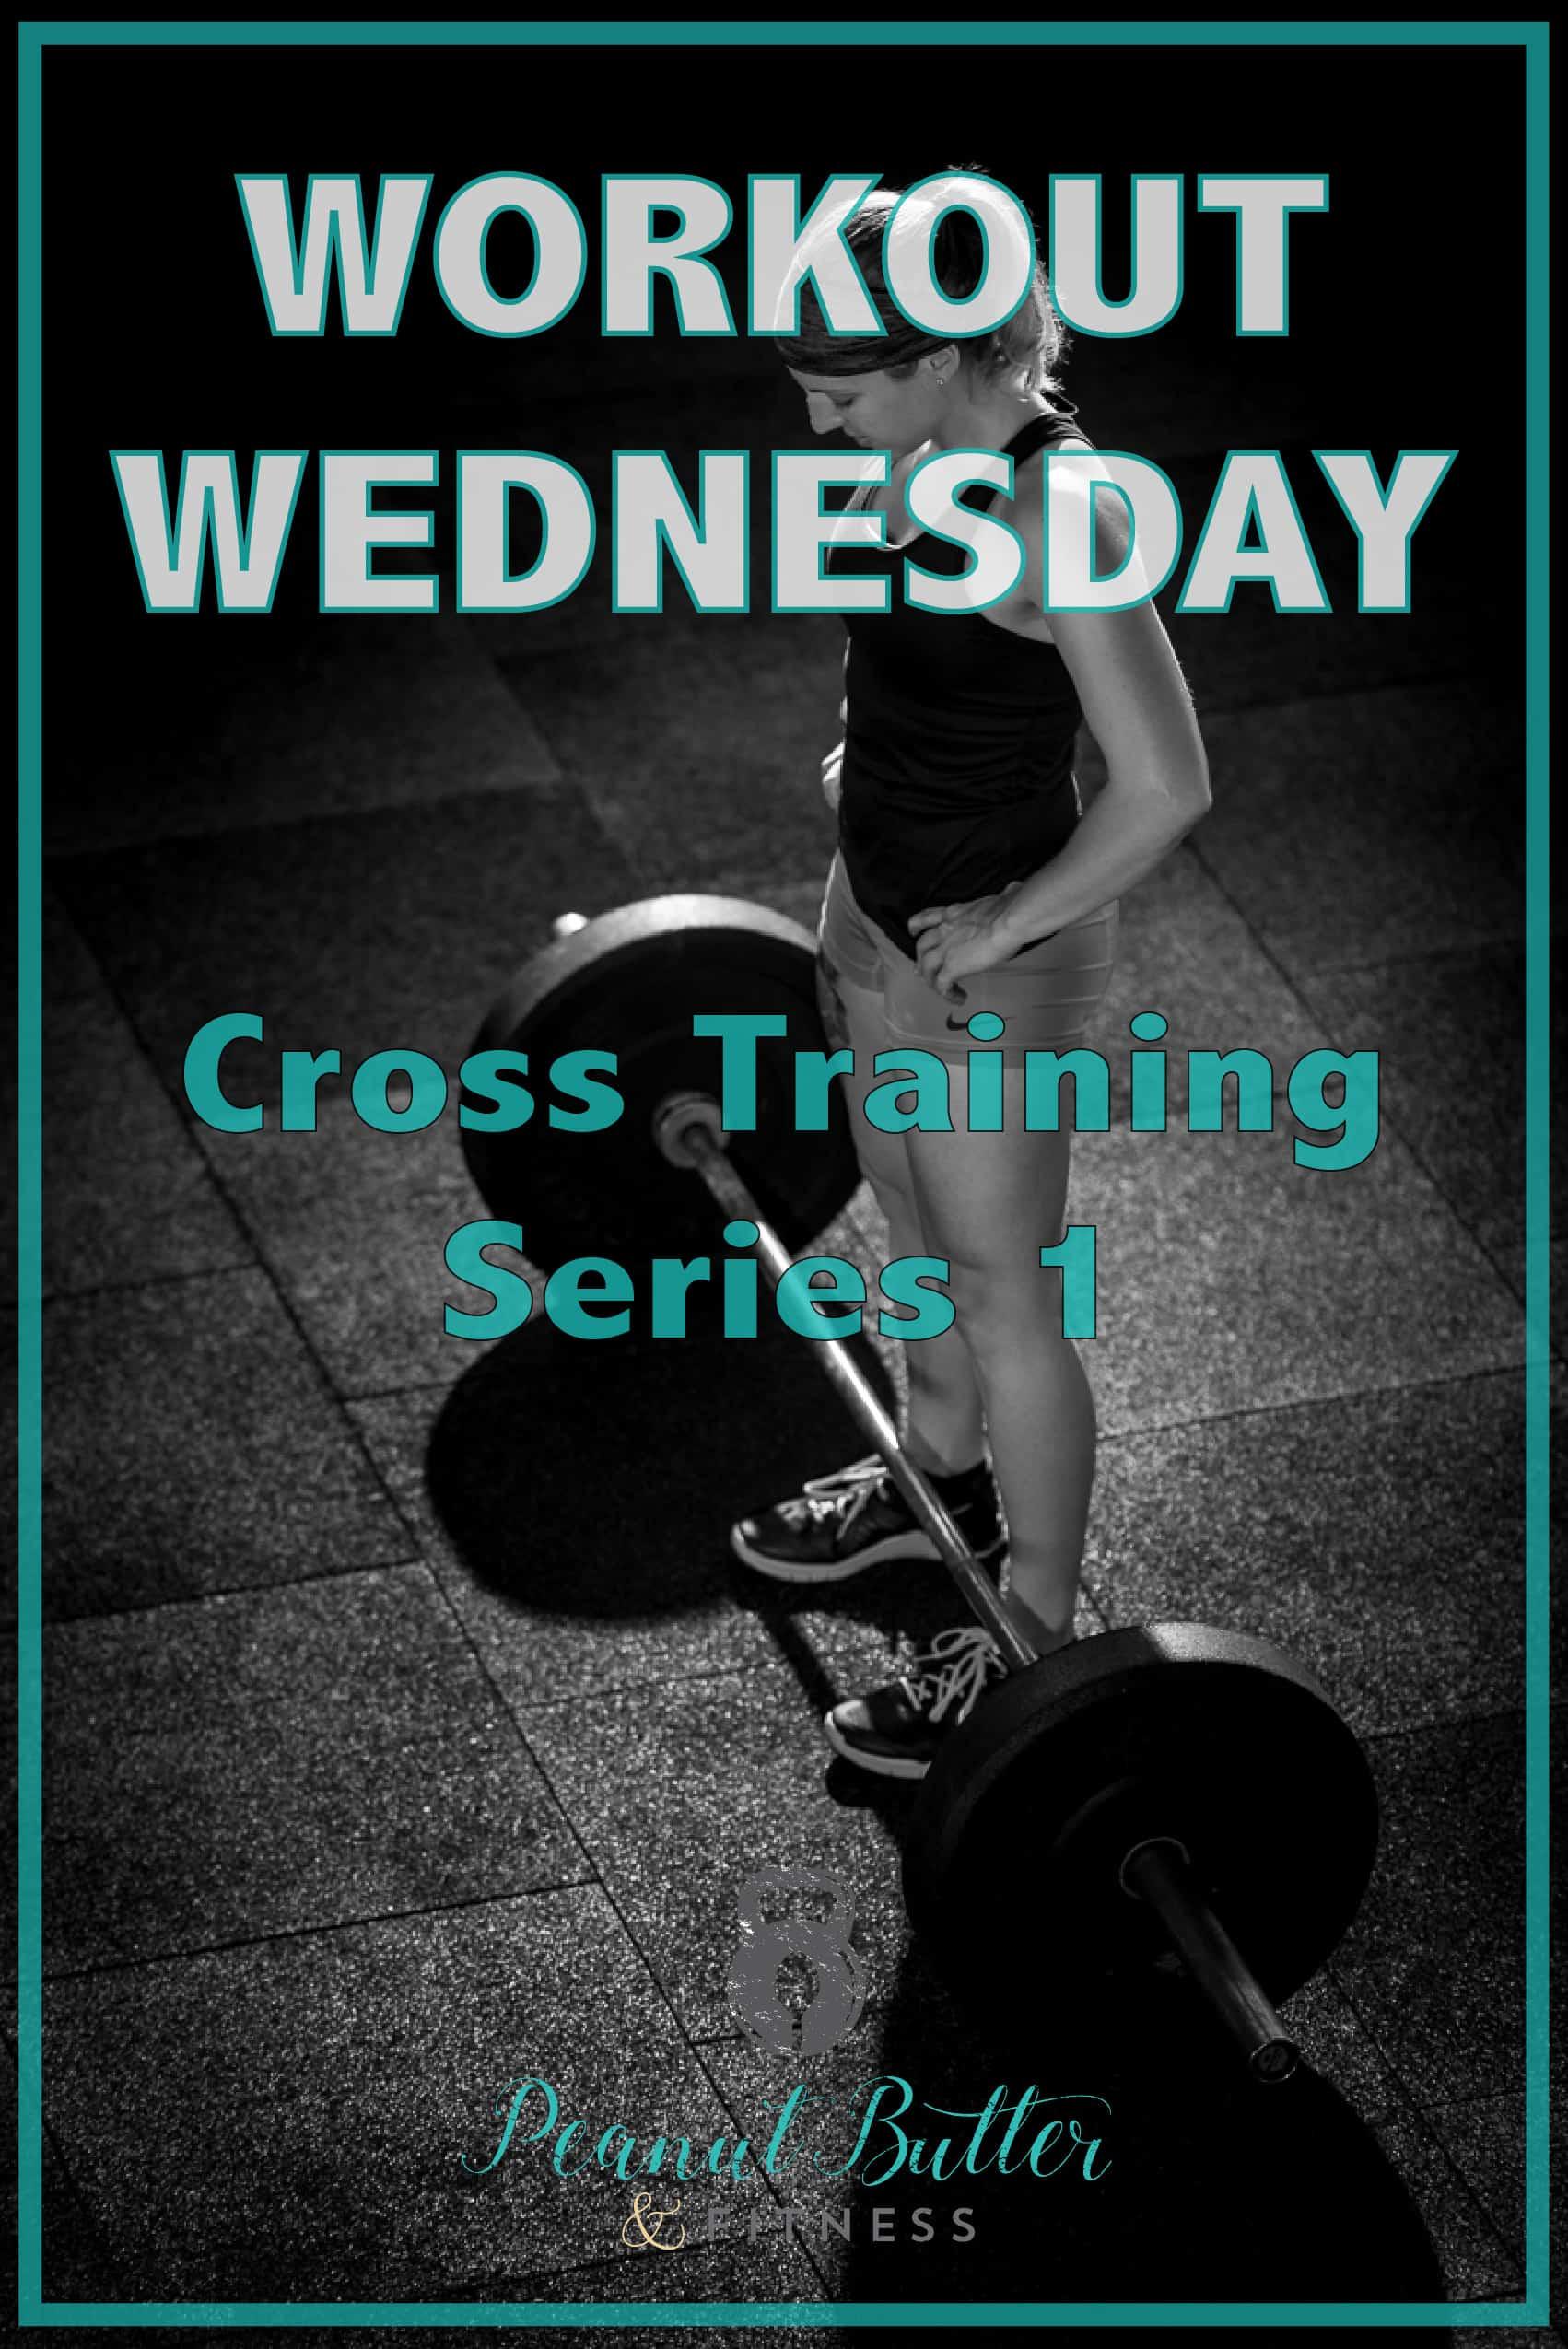 Workout wednesday - cross training series 1-01